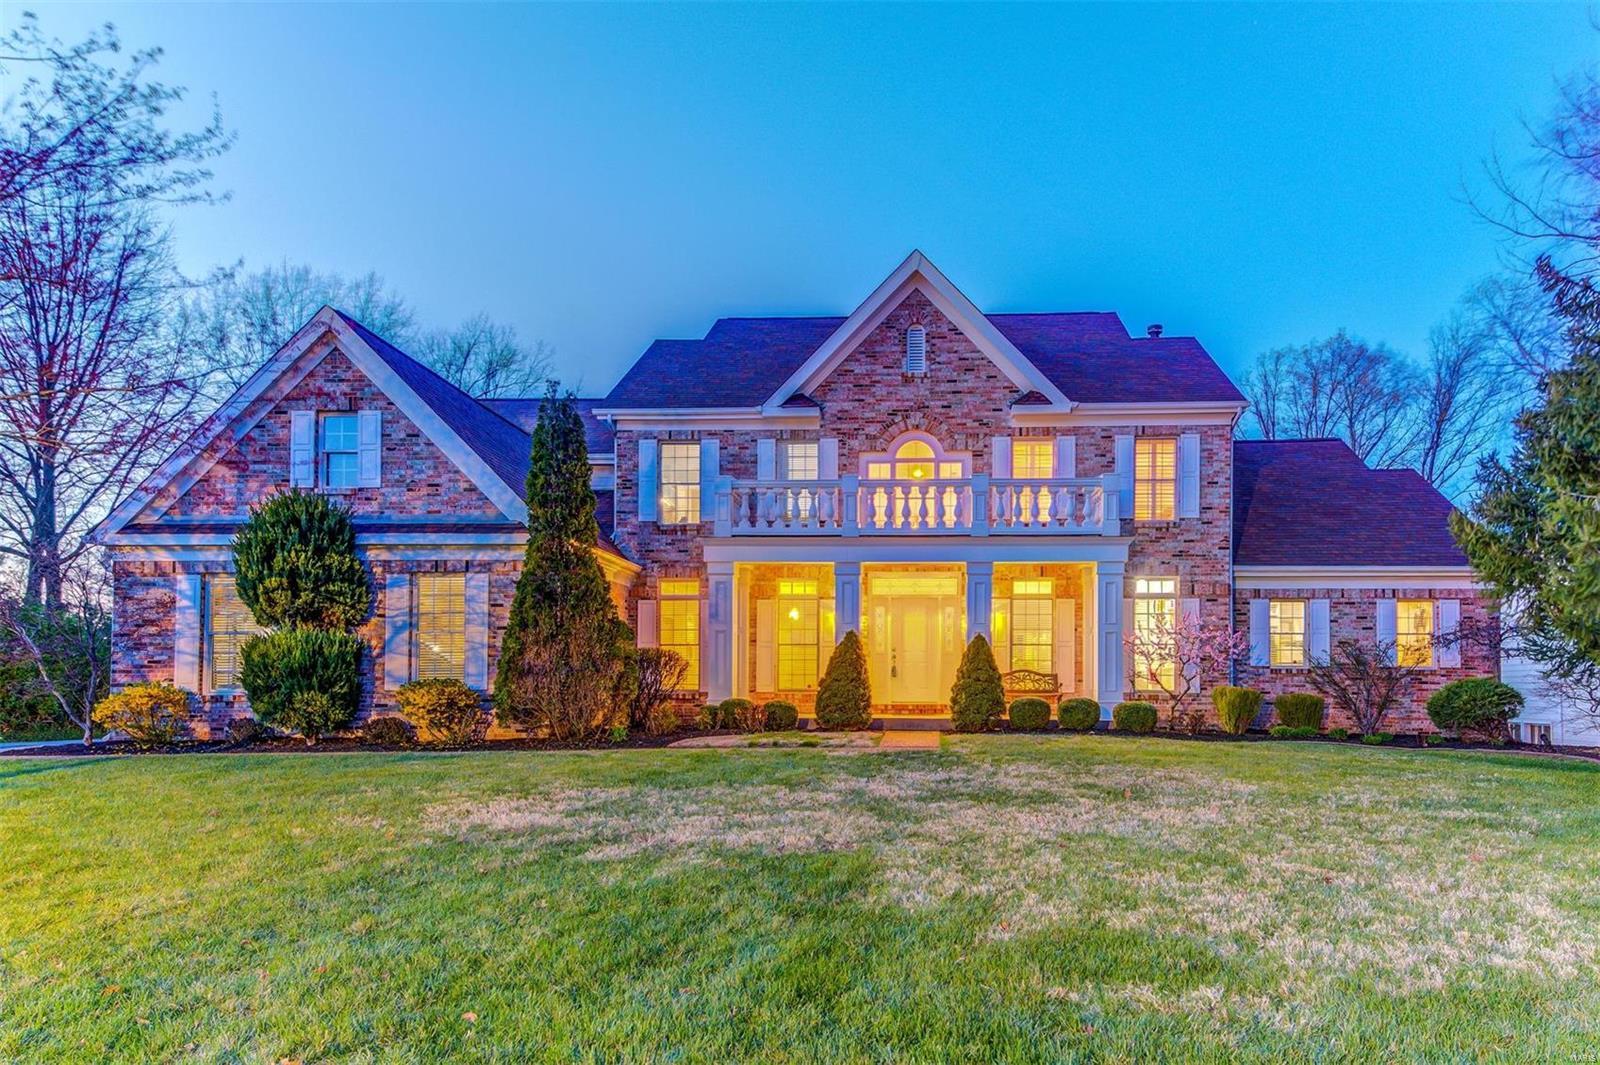 749 Kraffel Lane Property Photo - Chesterfield, MO real estate listing